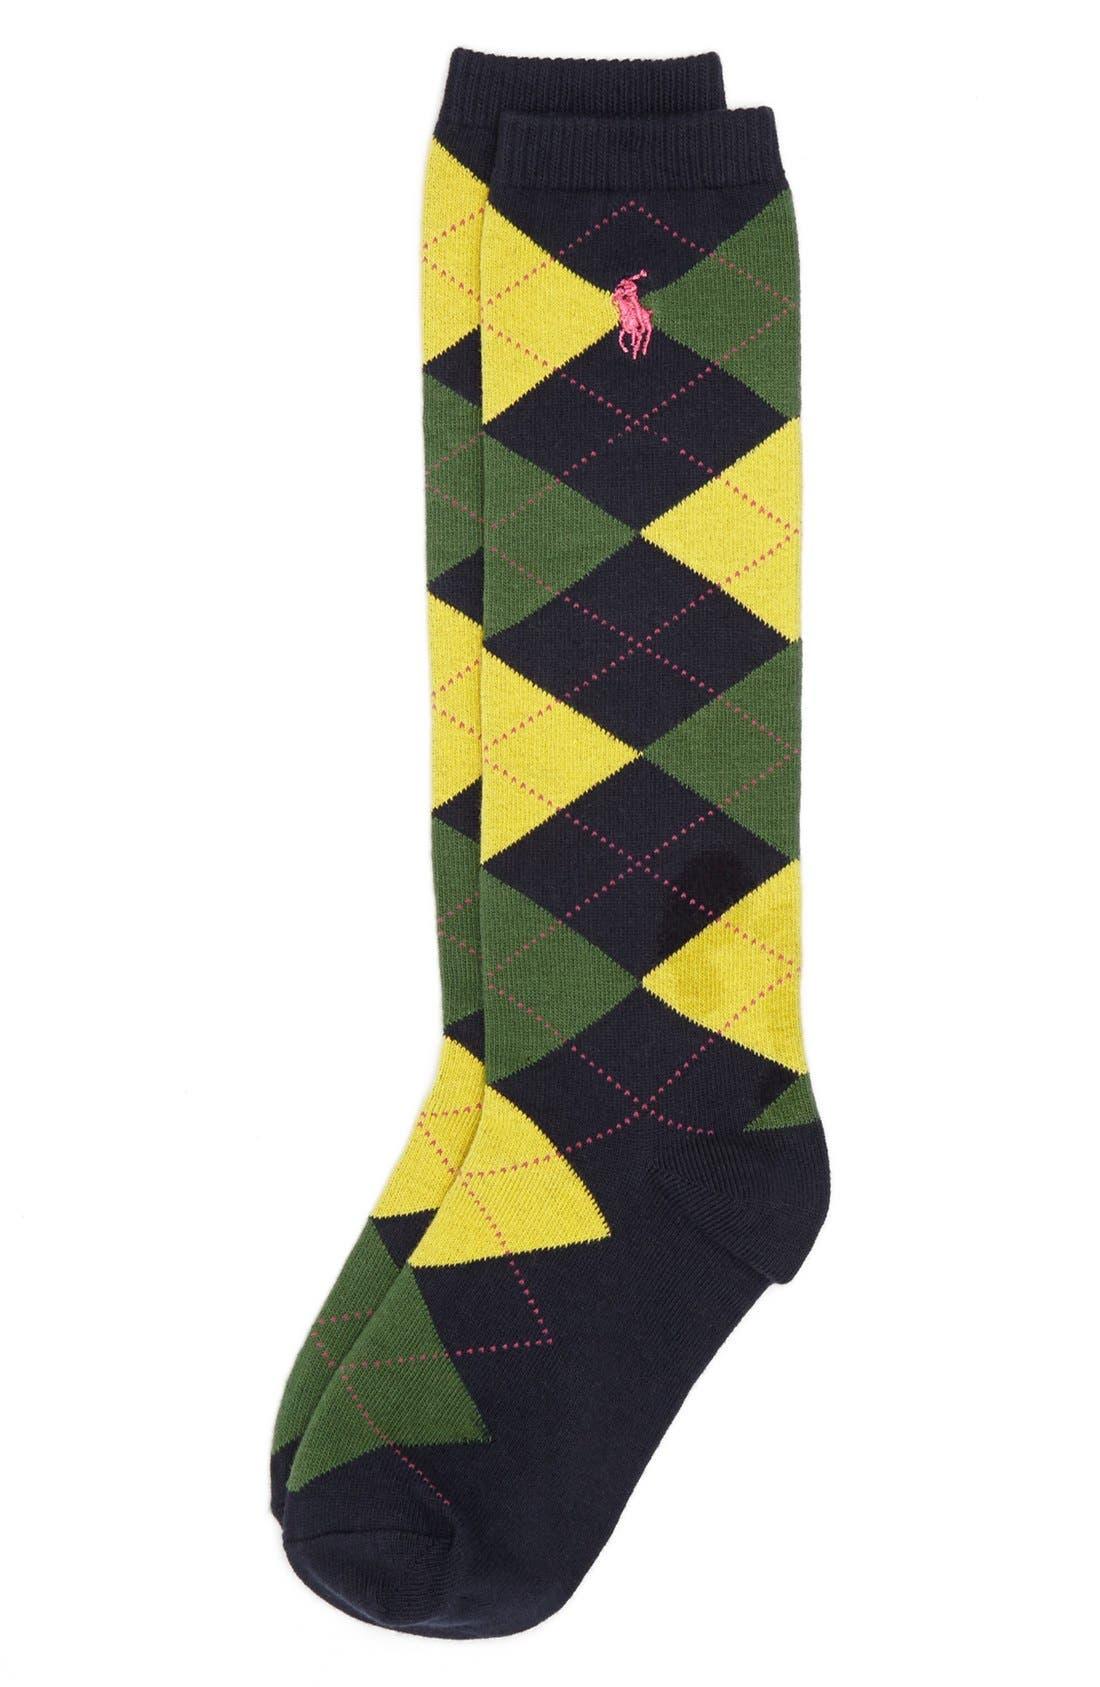 Main Image - Polo Ralph Lauren Argyle Knee High Socks (Big Kids)